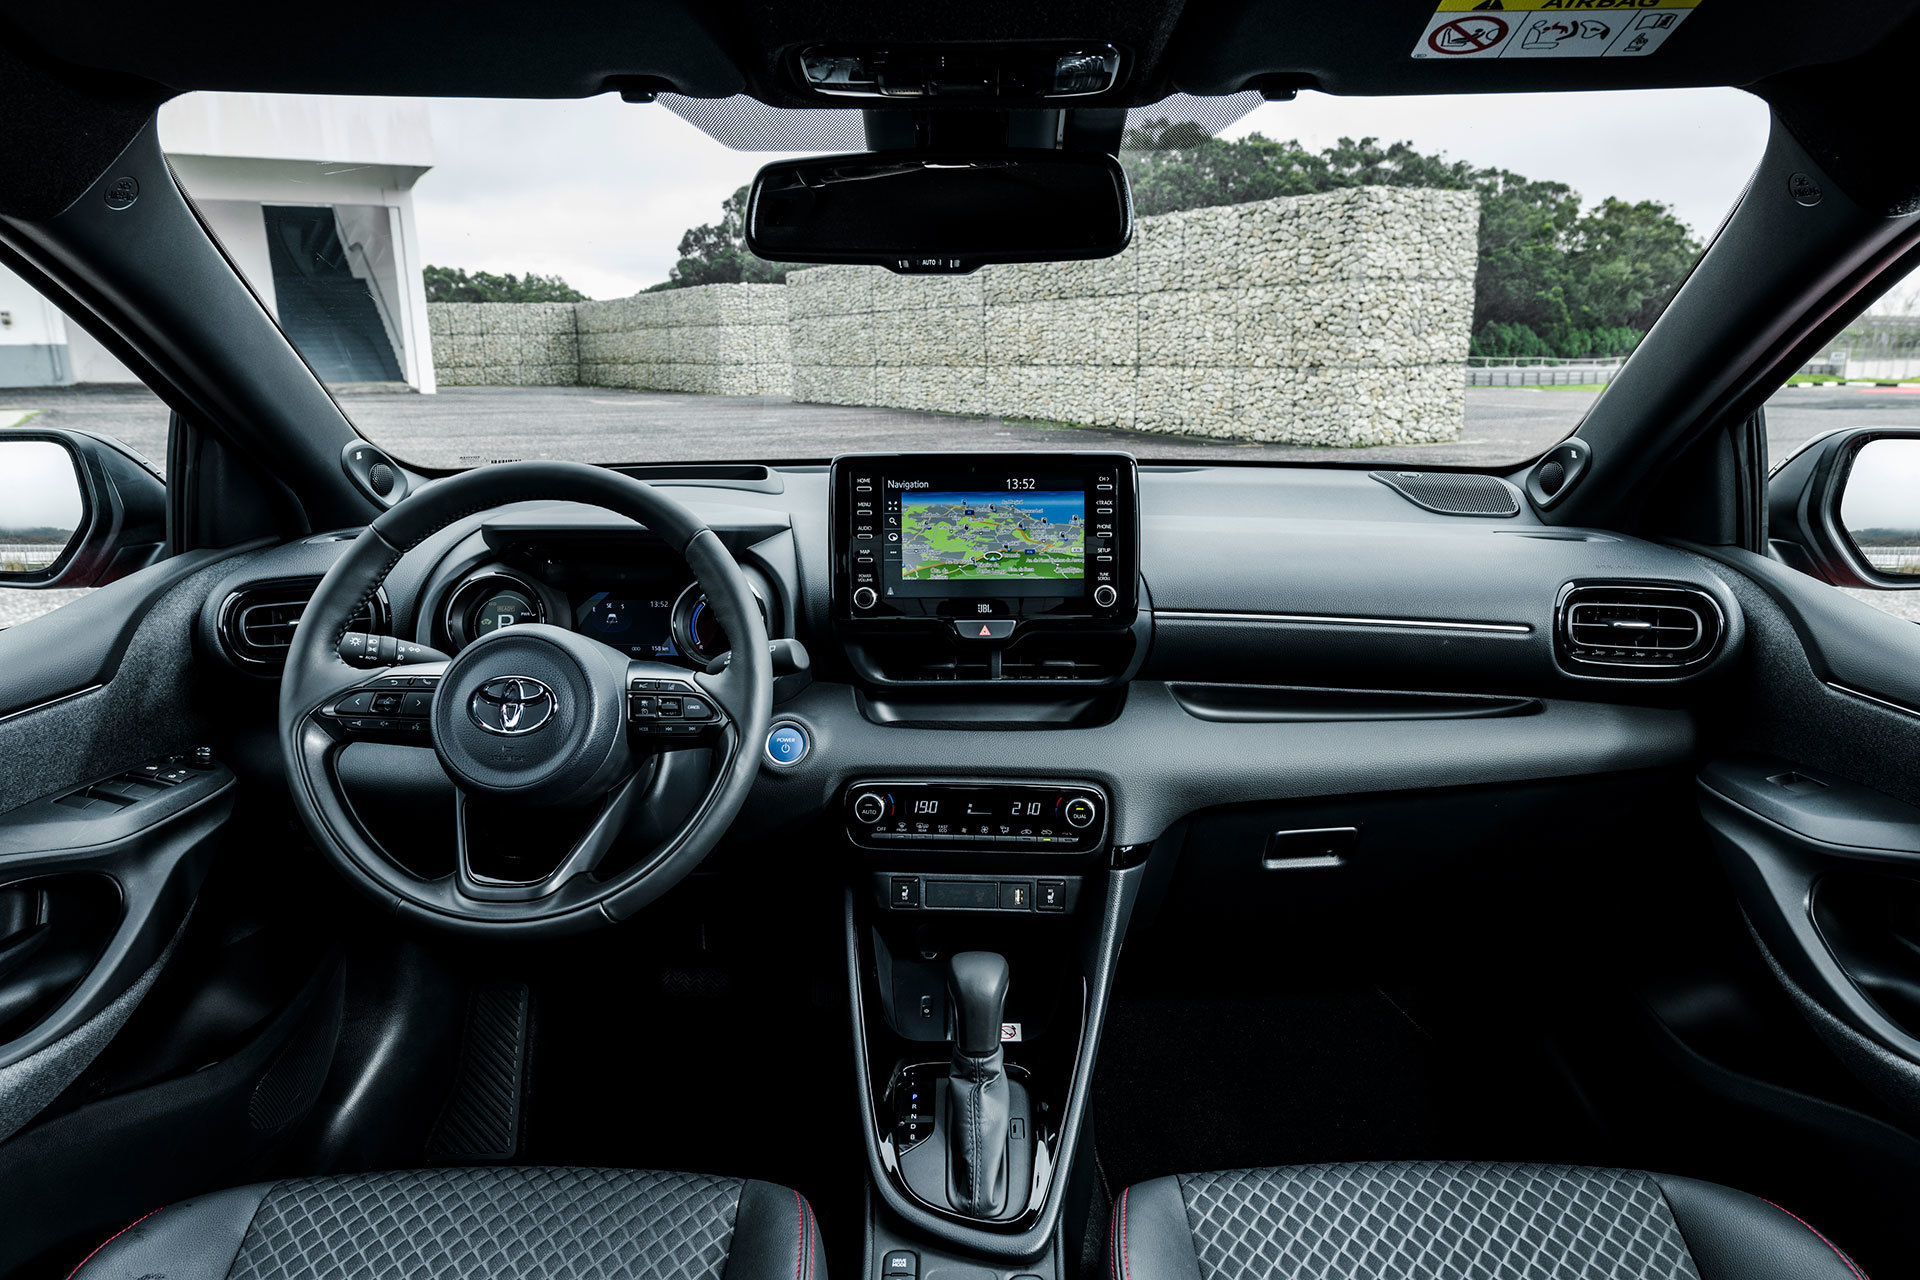 Toyota Yaris 2020 Interior 02